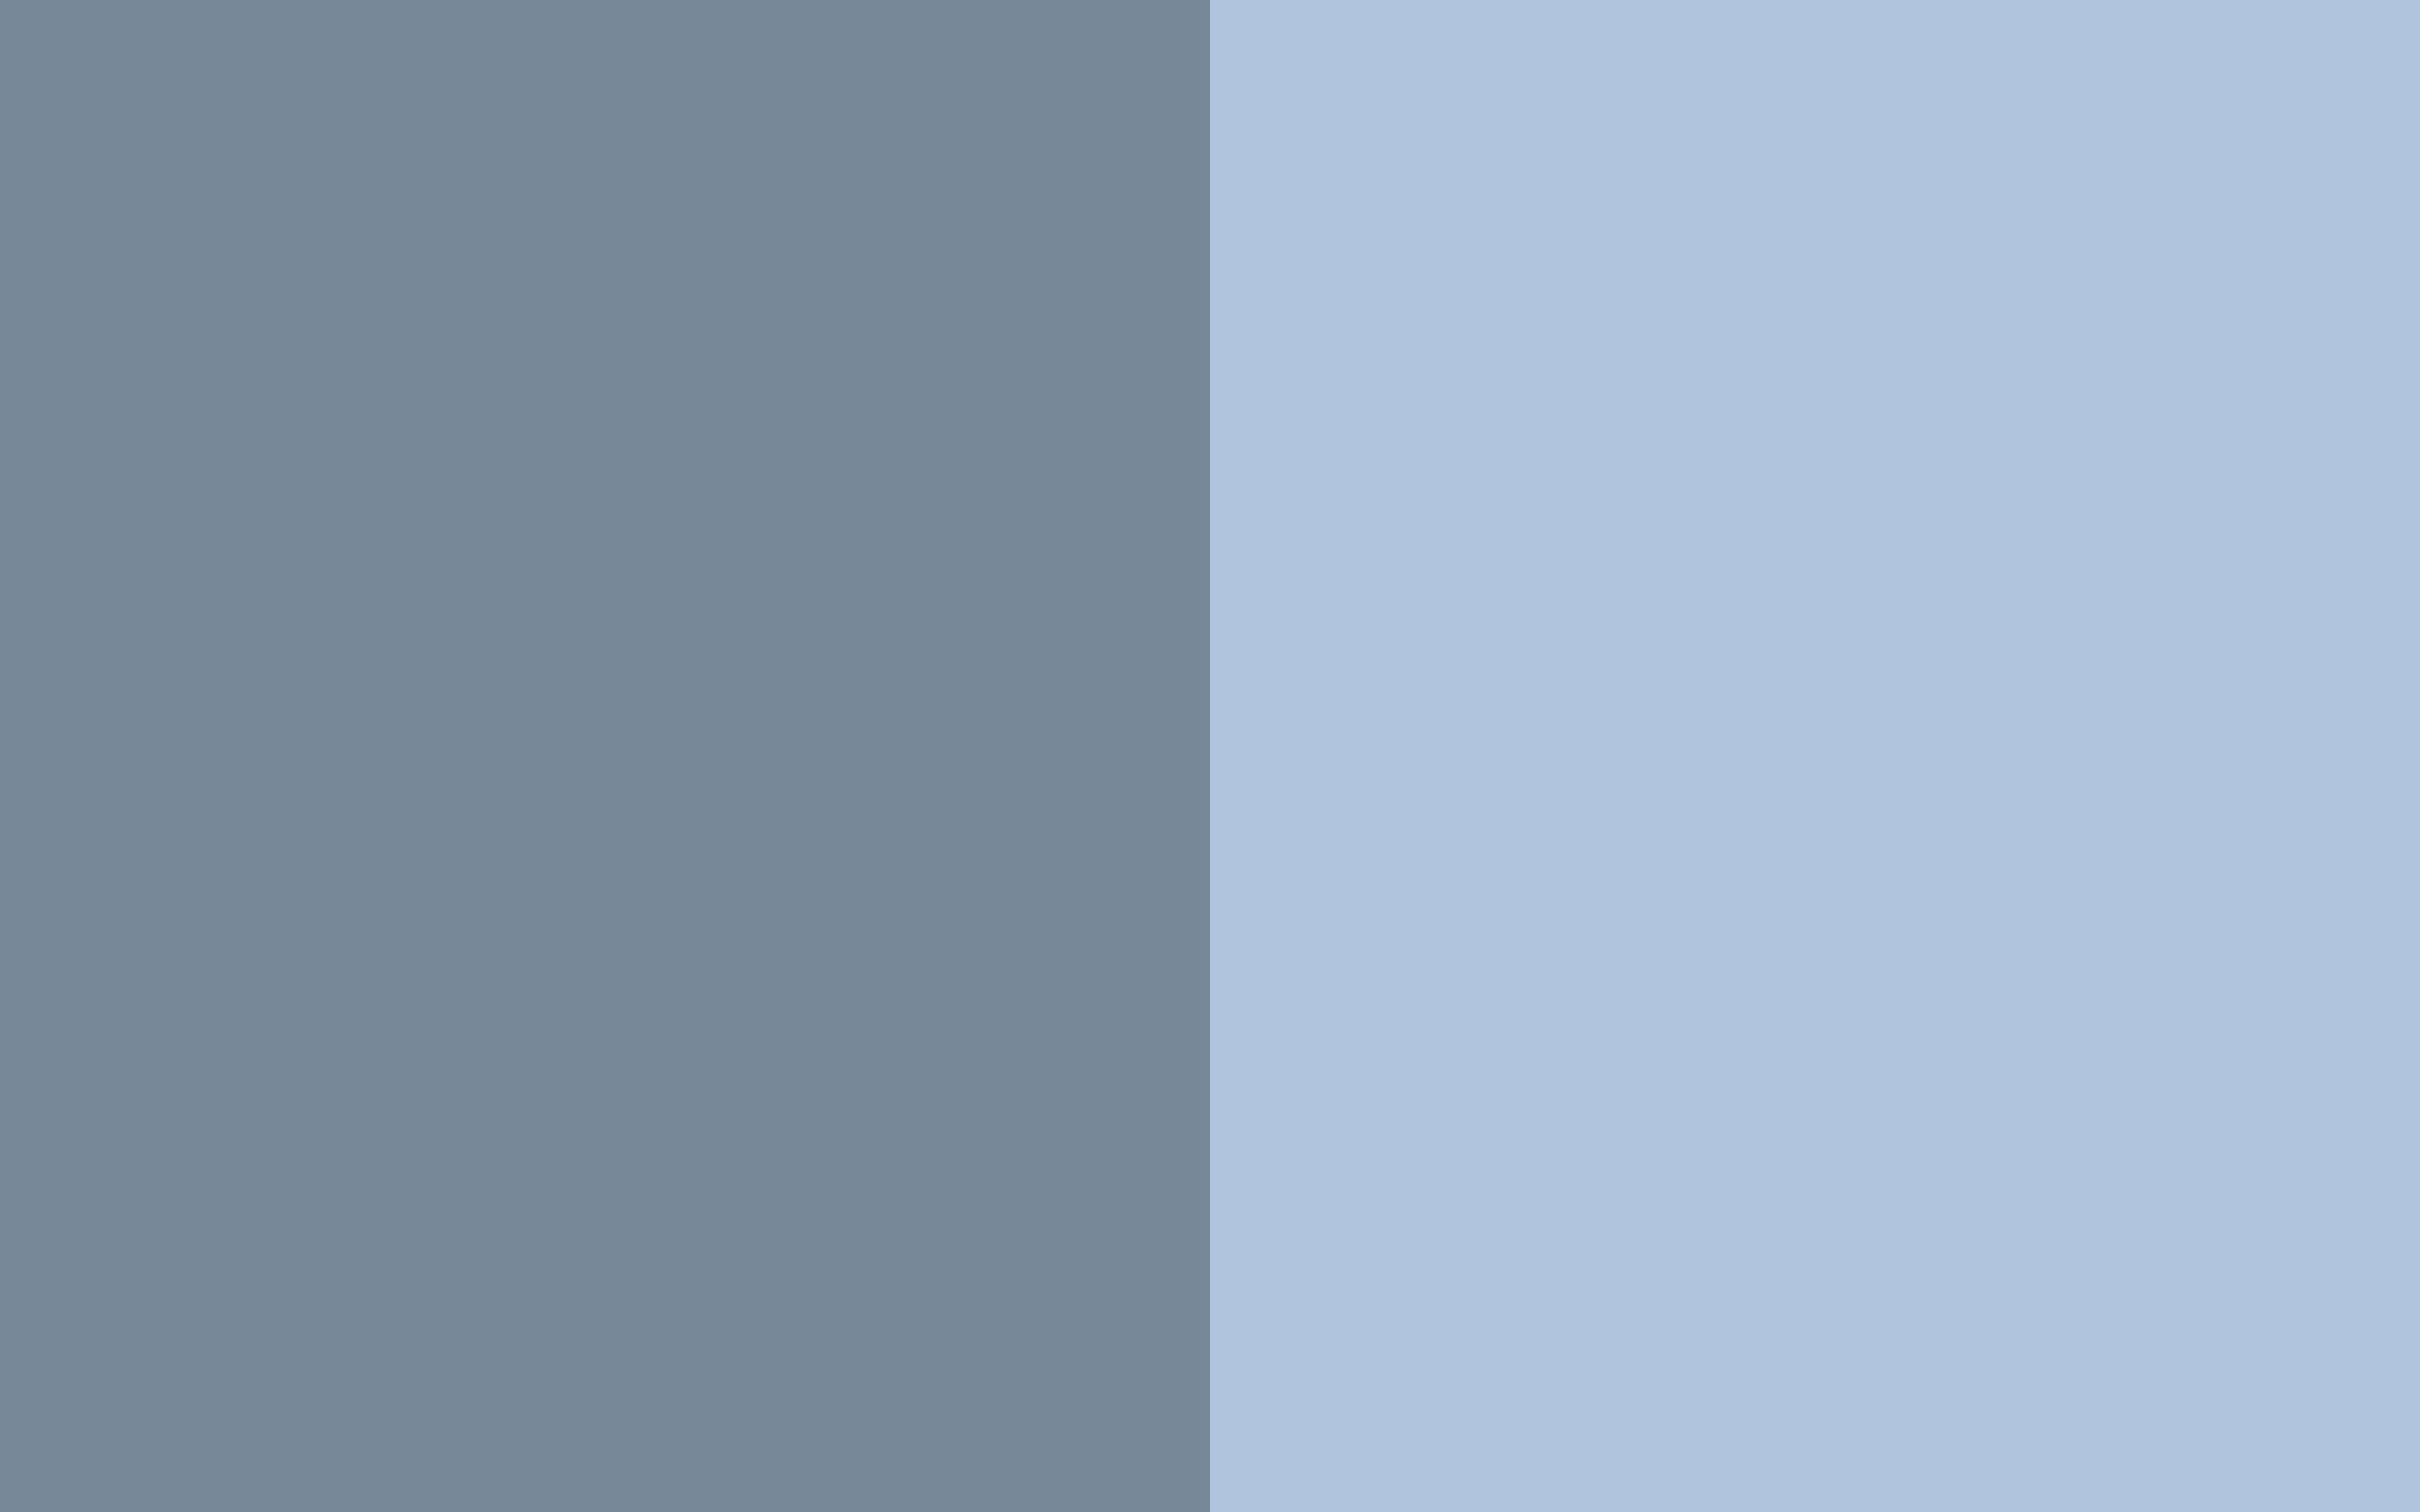 Light Gray Blue Background light slate gray and